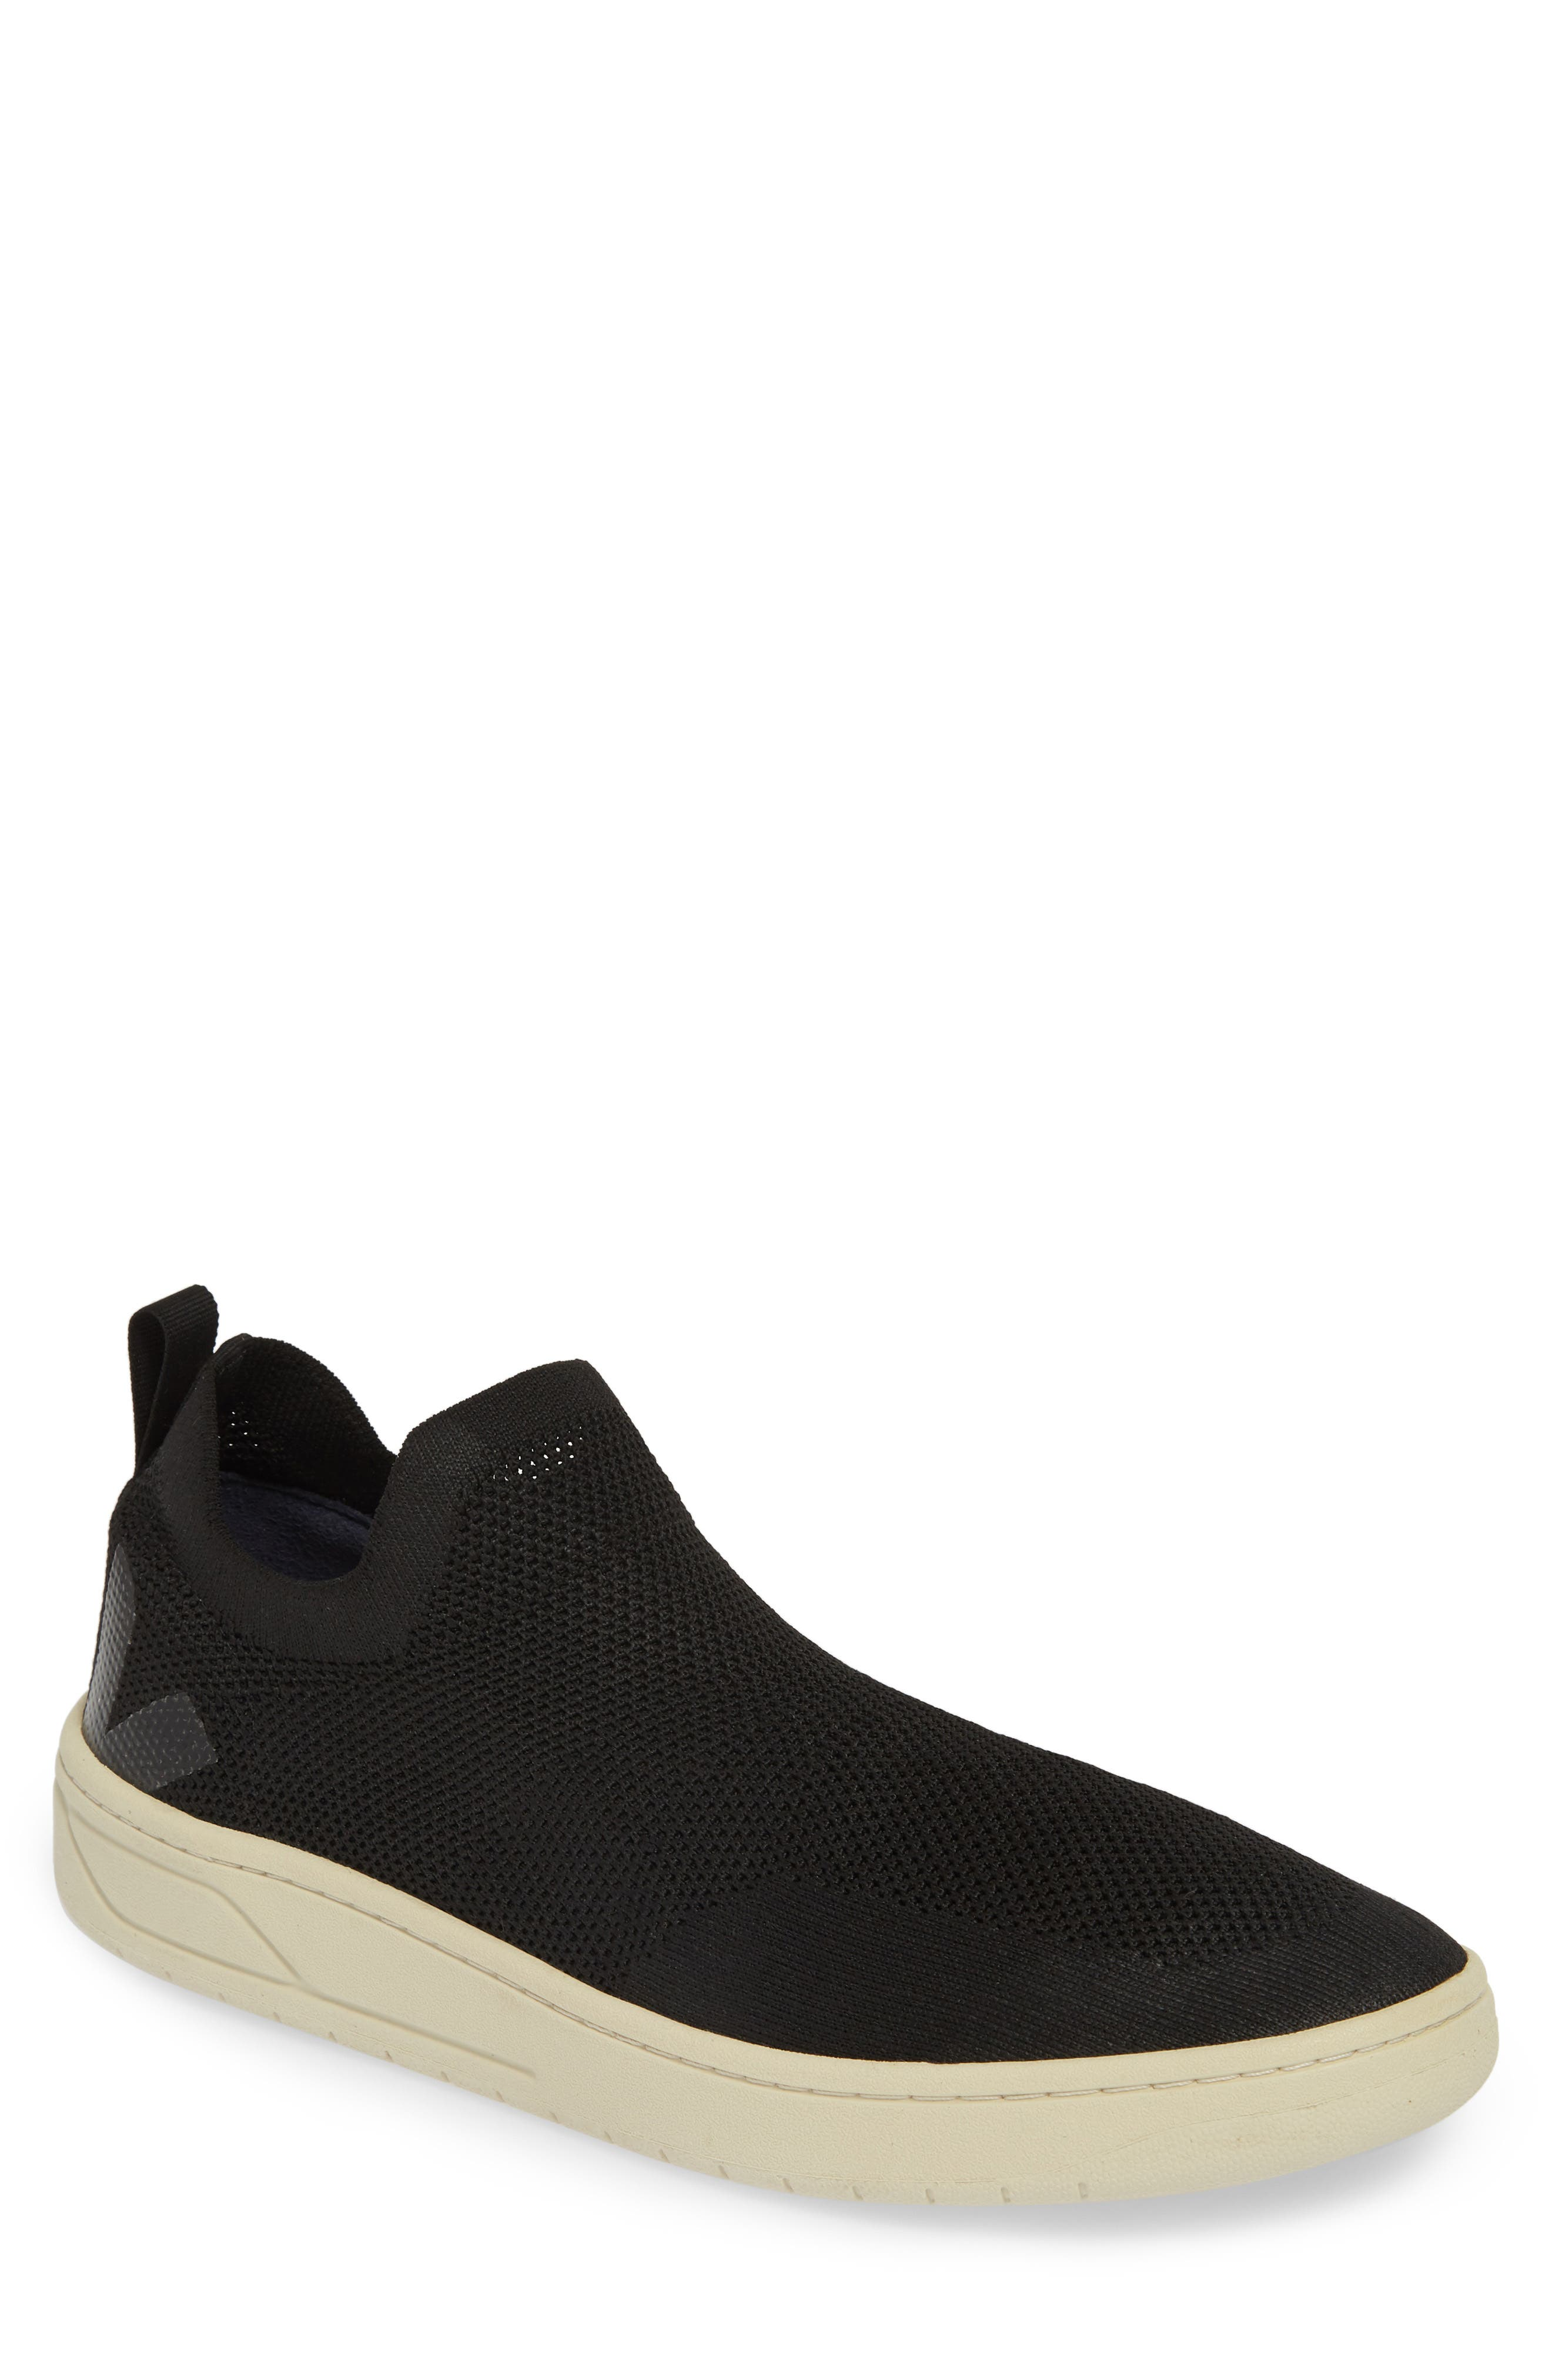 Veja X Lemaire Aquashoe Sneaker, Black